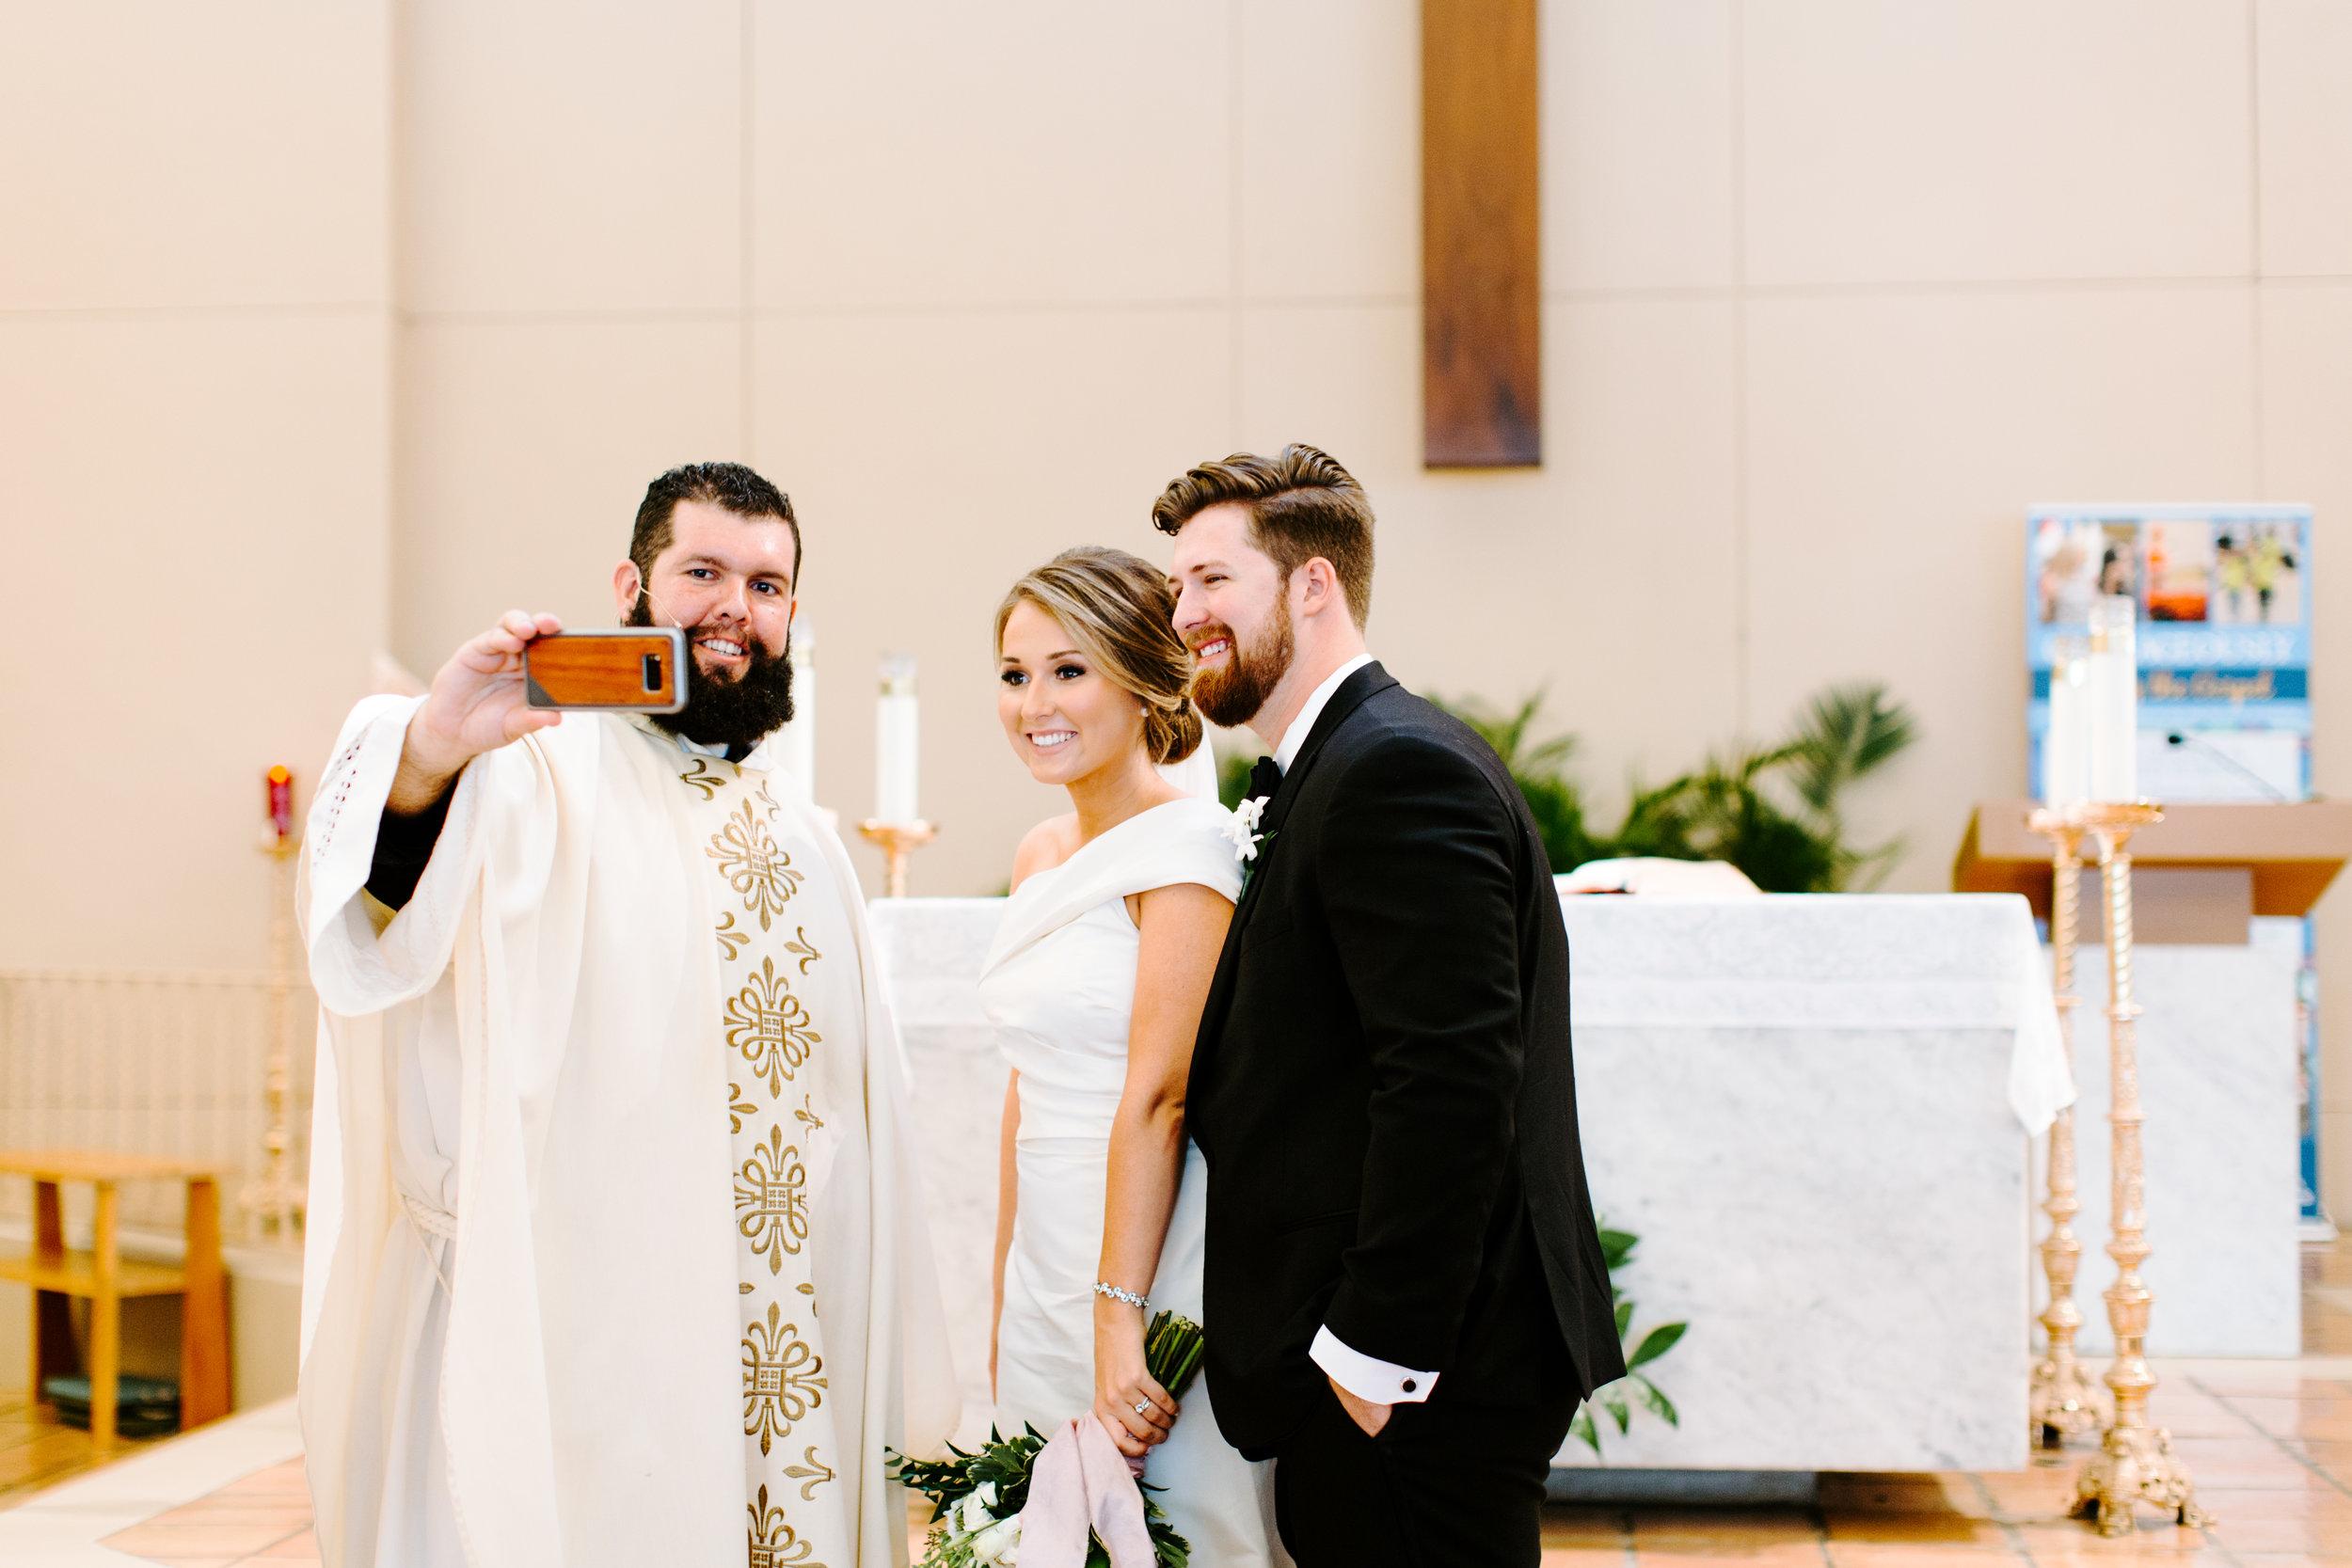 selfie with priest